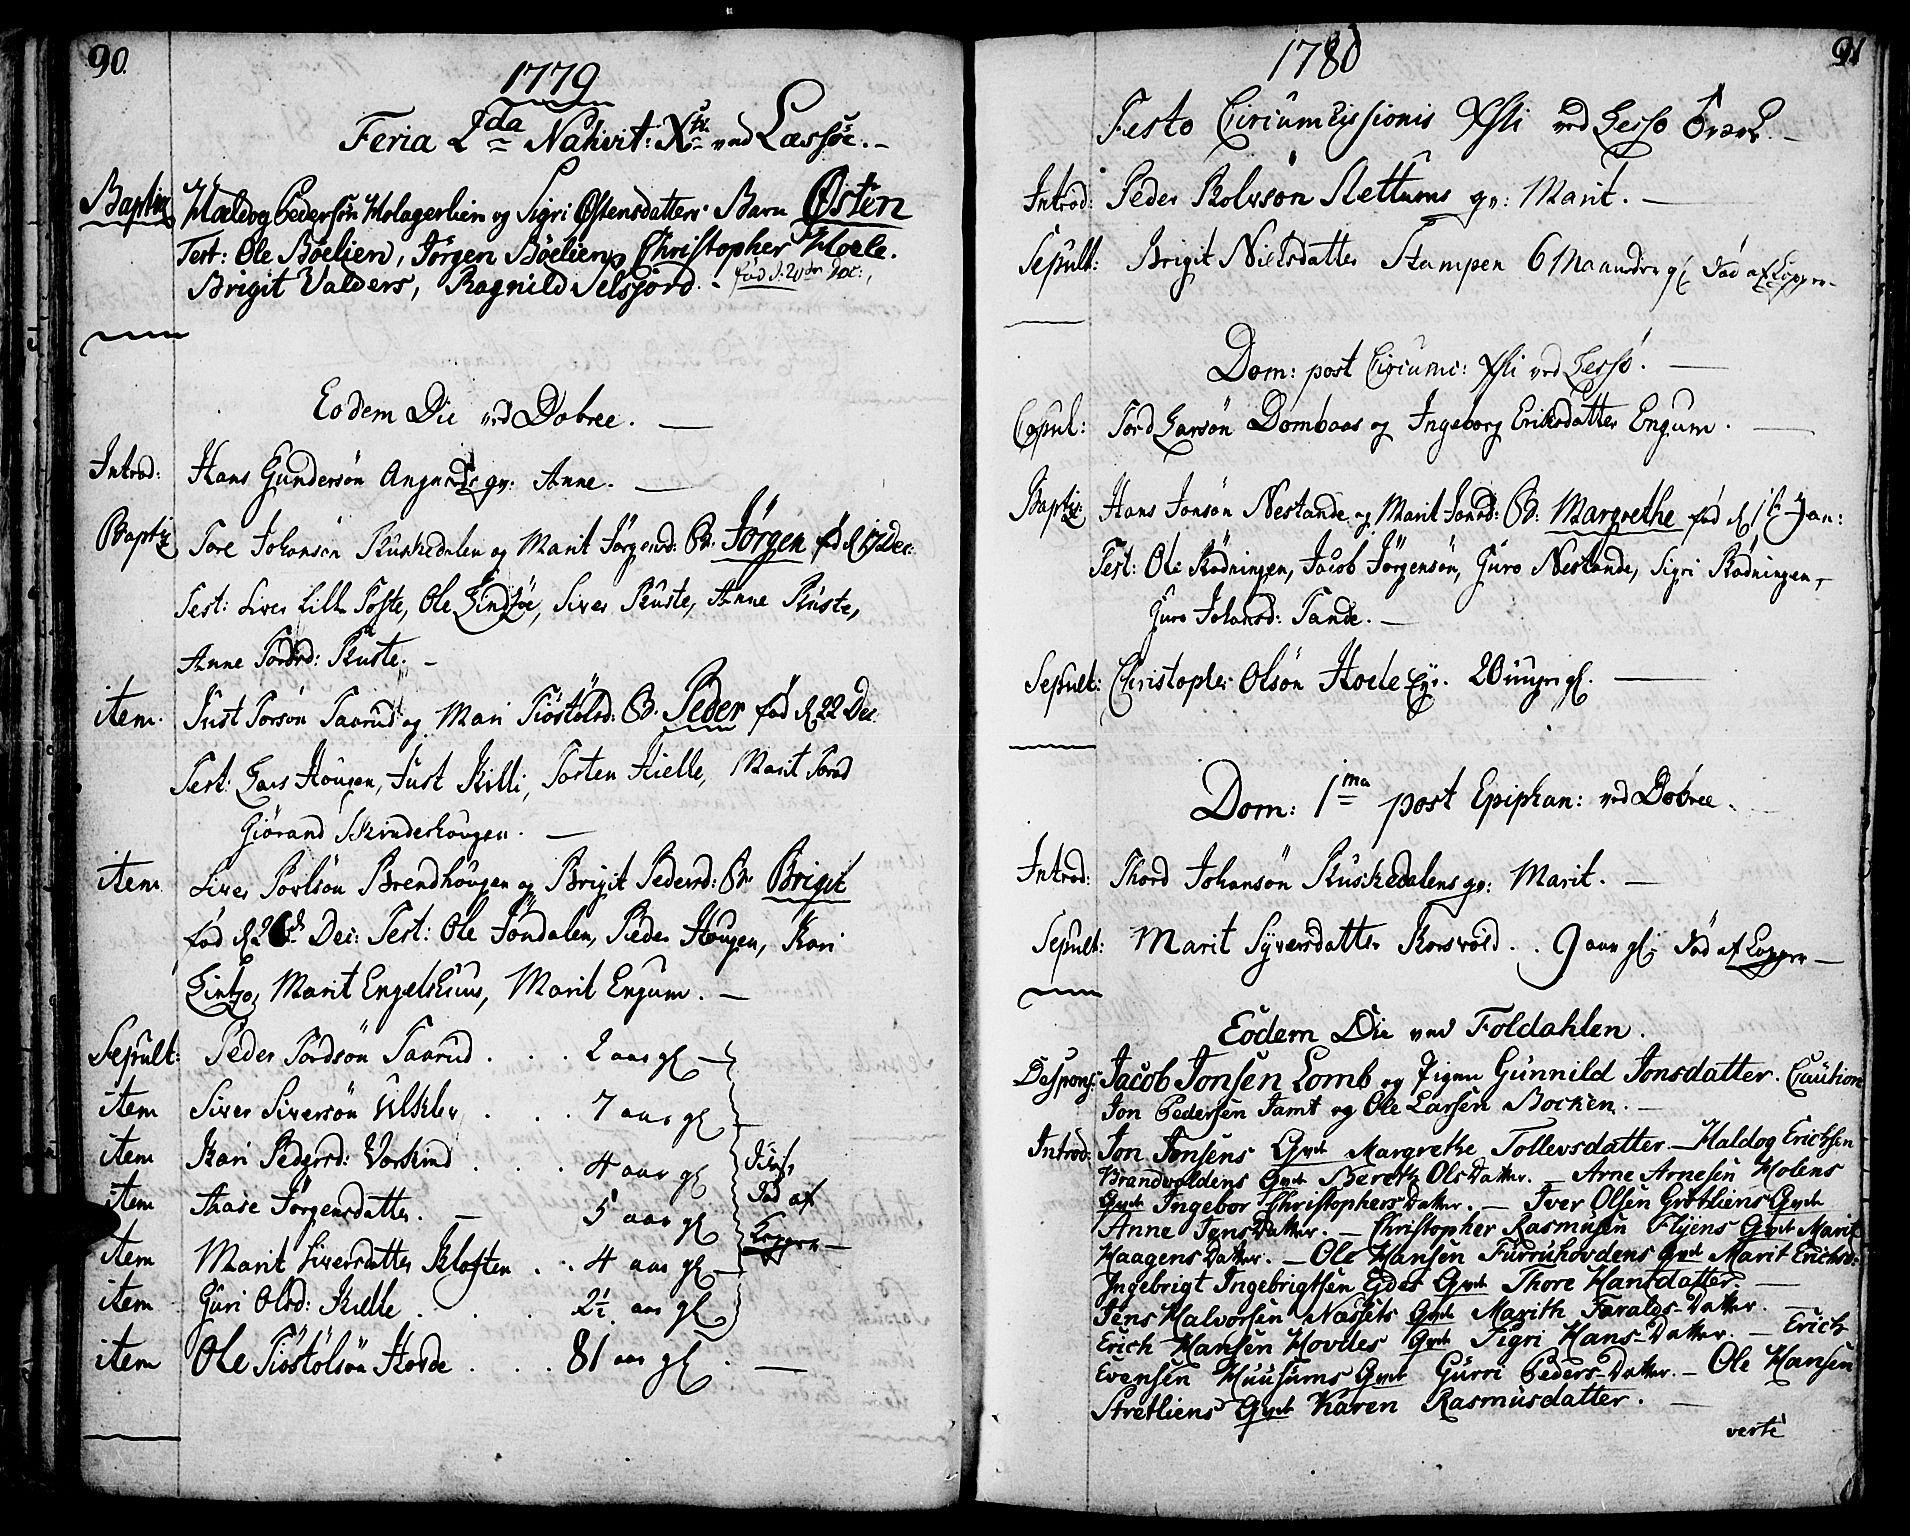 SAH, Lesja prestekontor, Ministerialbok nr. 3, 1777-1819, s. 90-91